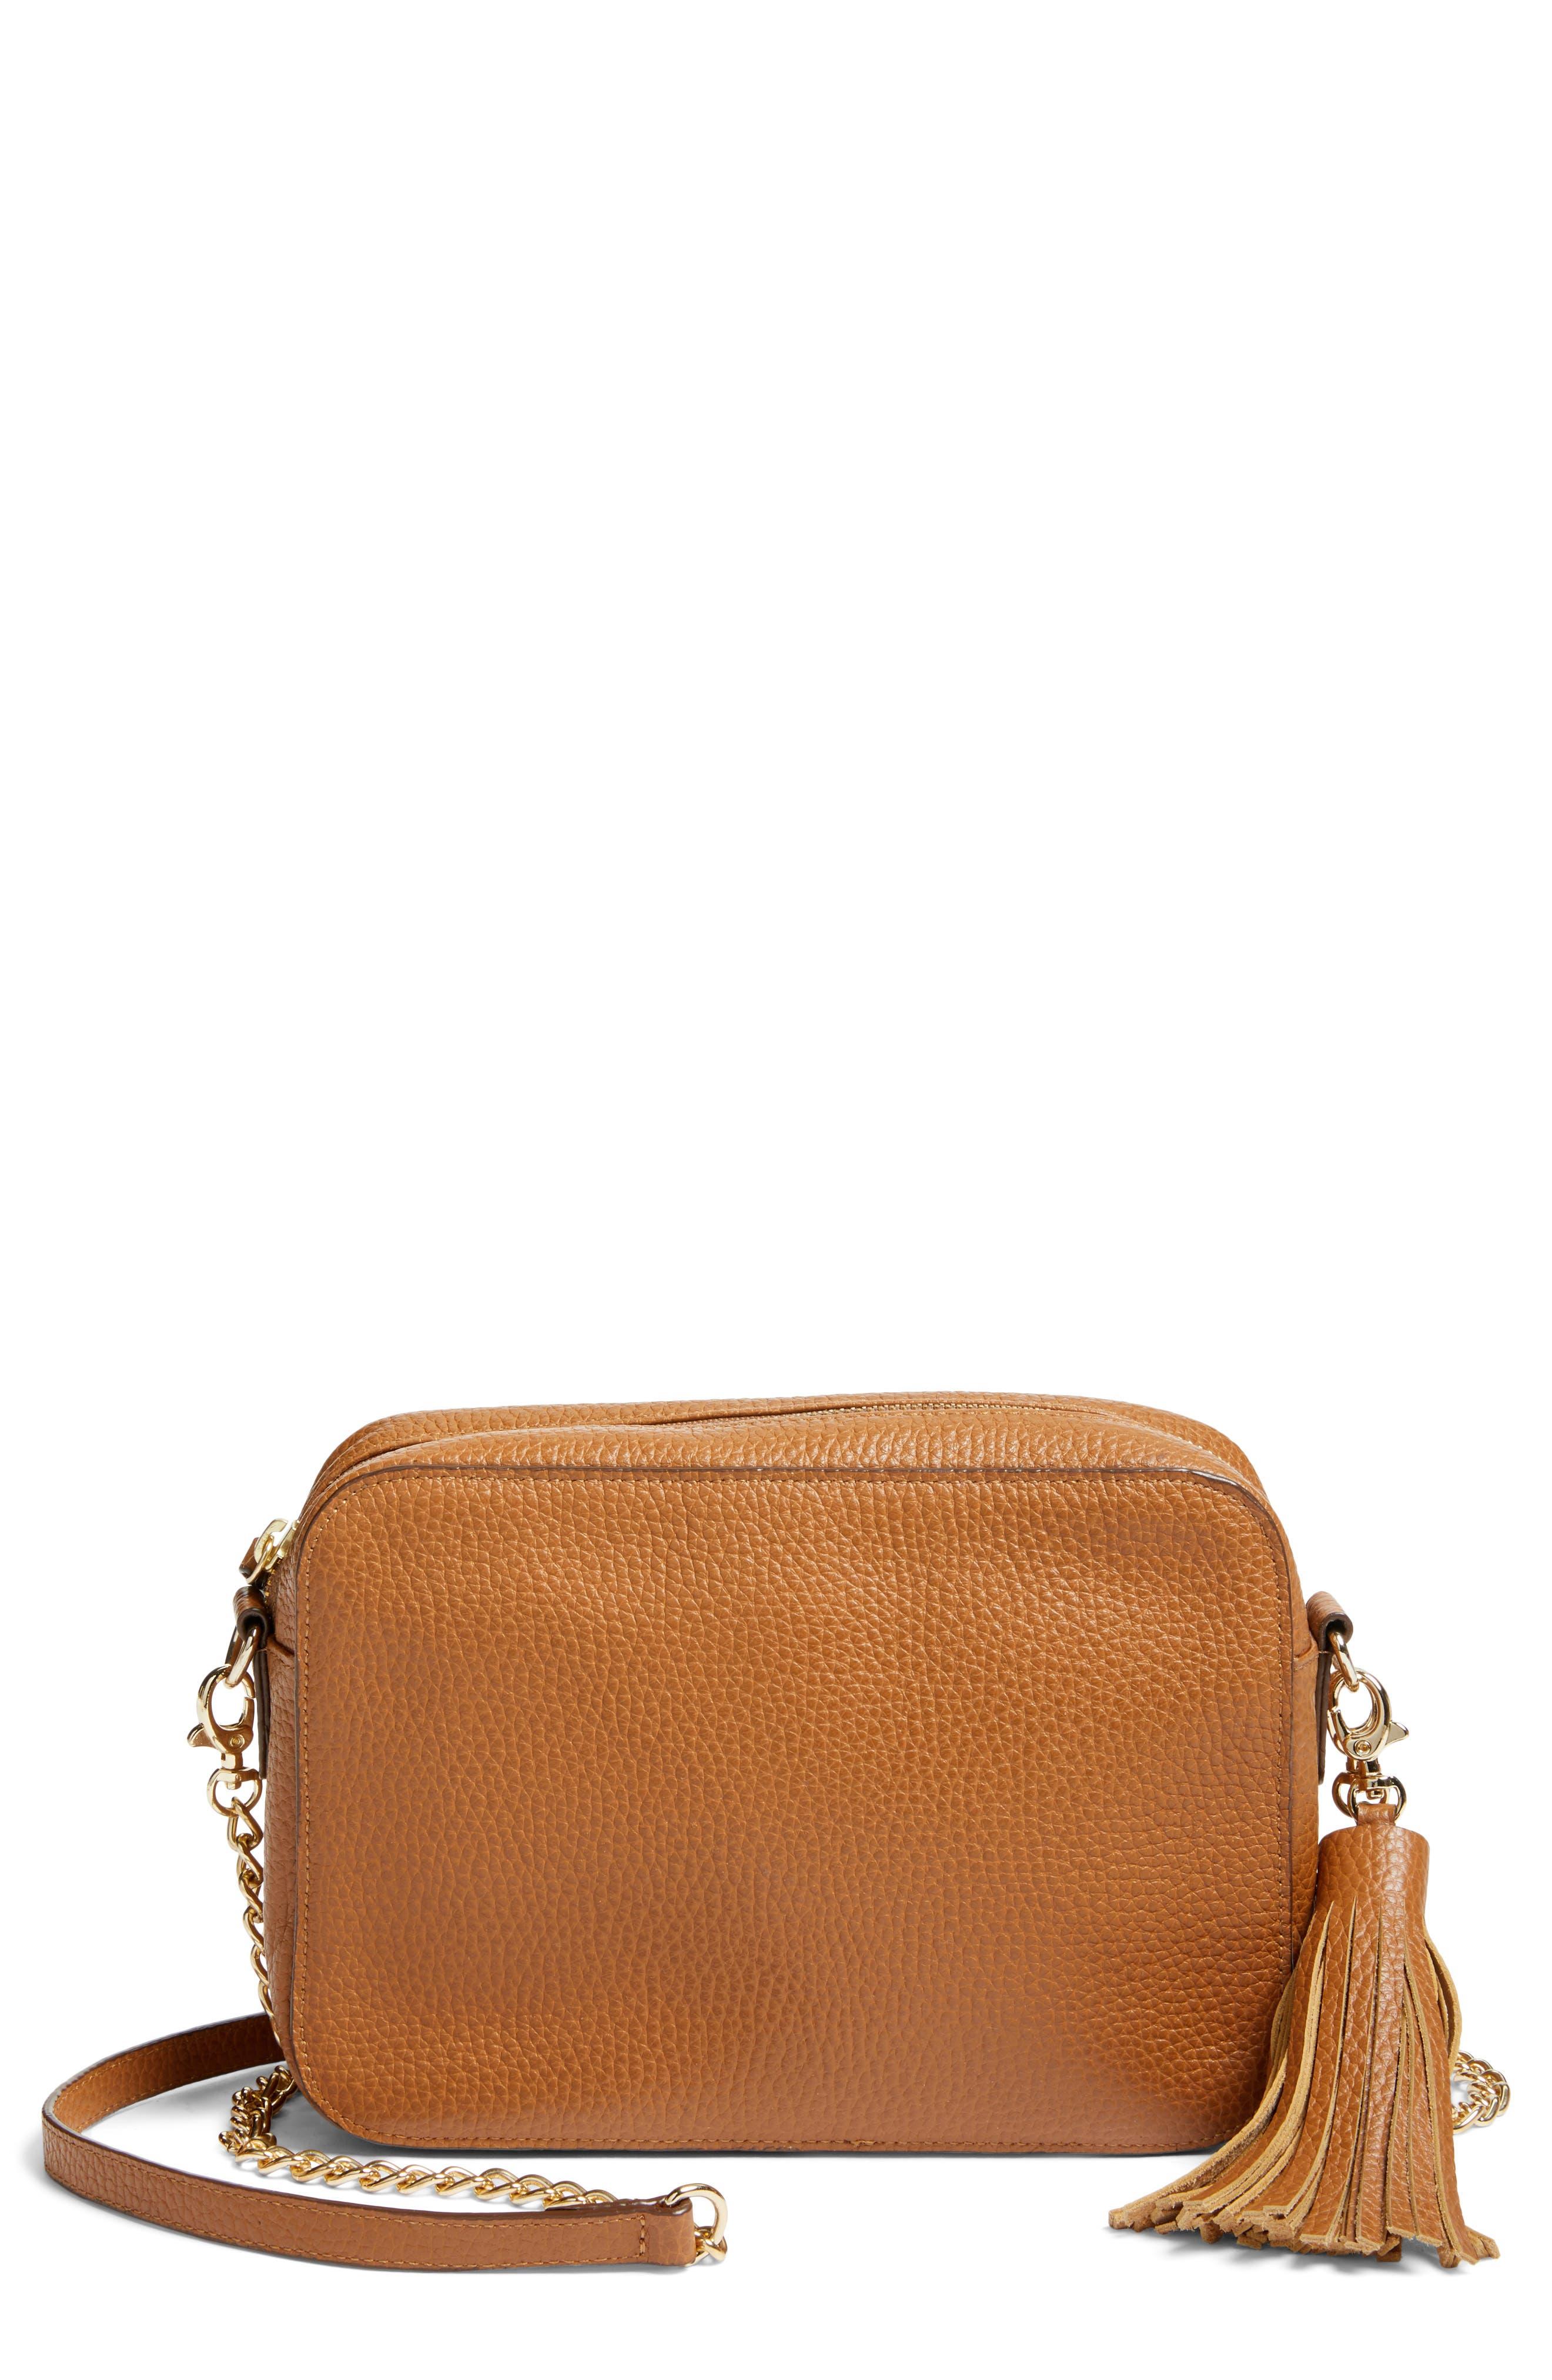 Nordstrom Ella Tassel Leather Crossbody Bag